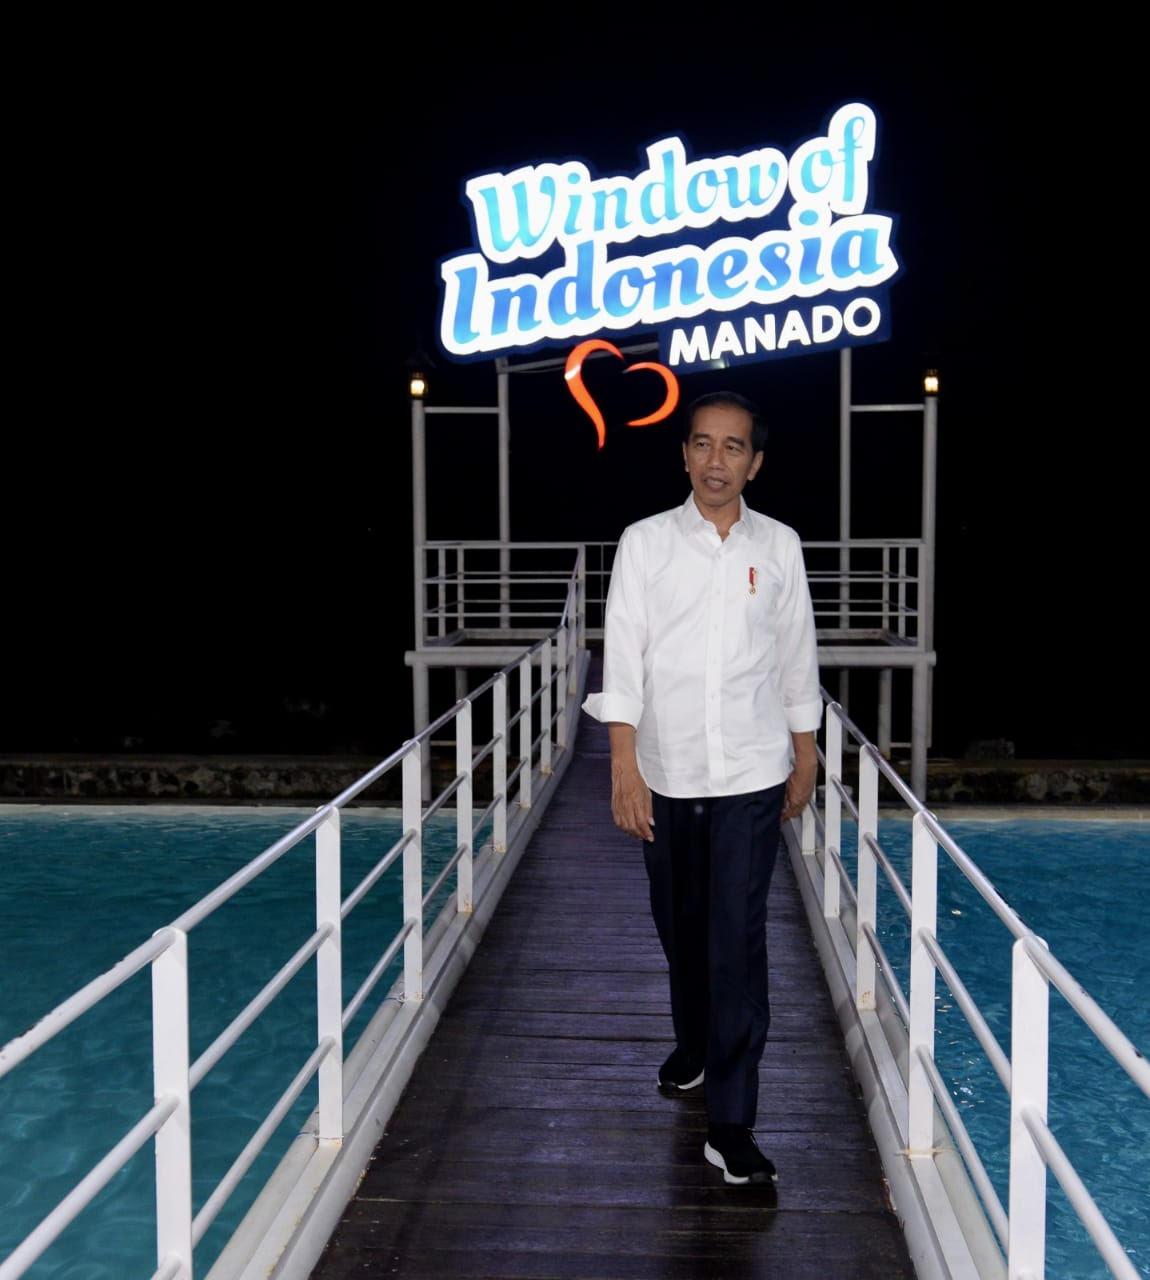 https: img.okezone.com content 2019 07 05 406 2075007 saat-presiden-jokowi-menikmati-wisata-jendela-indonesia-re6YJbIKBk.jpg